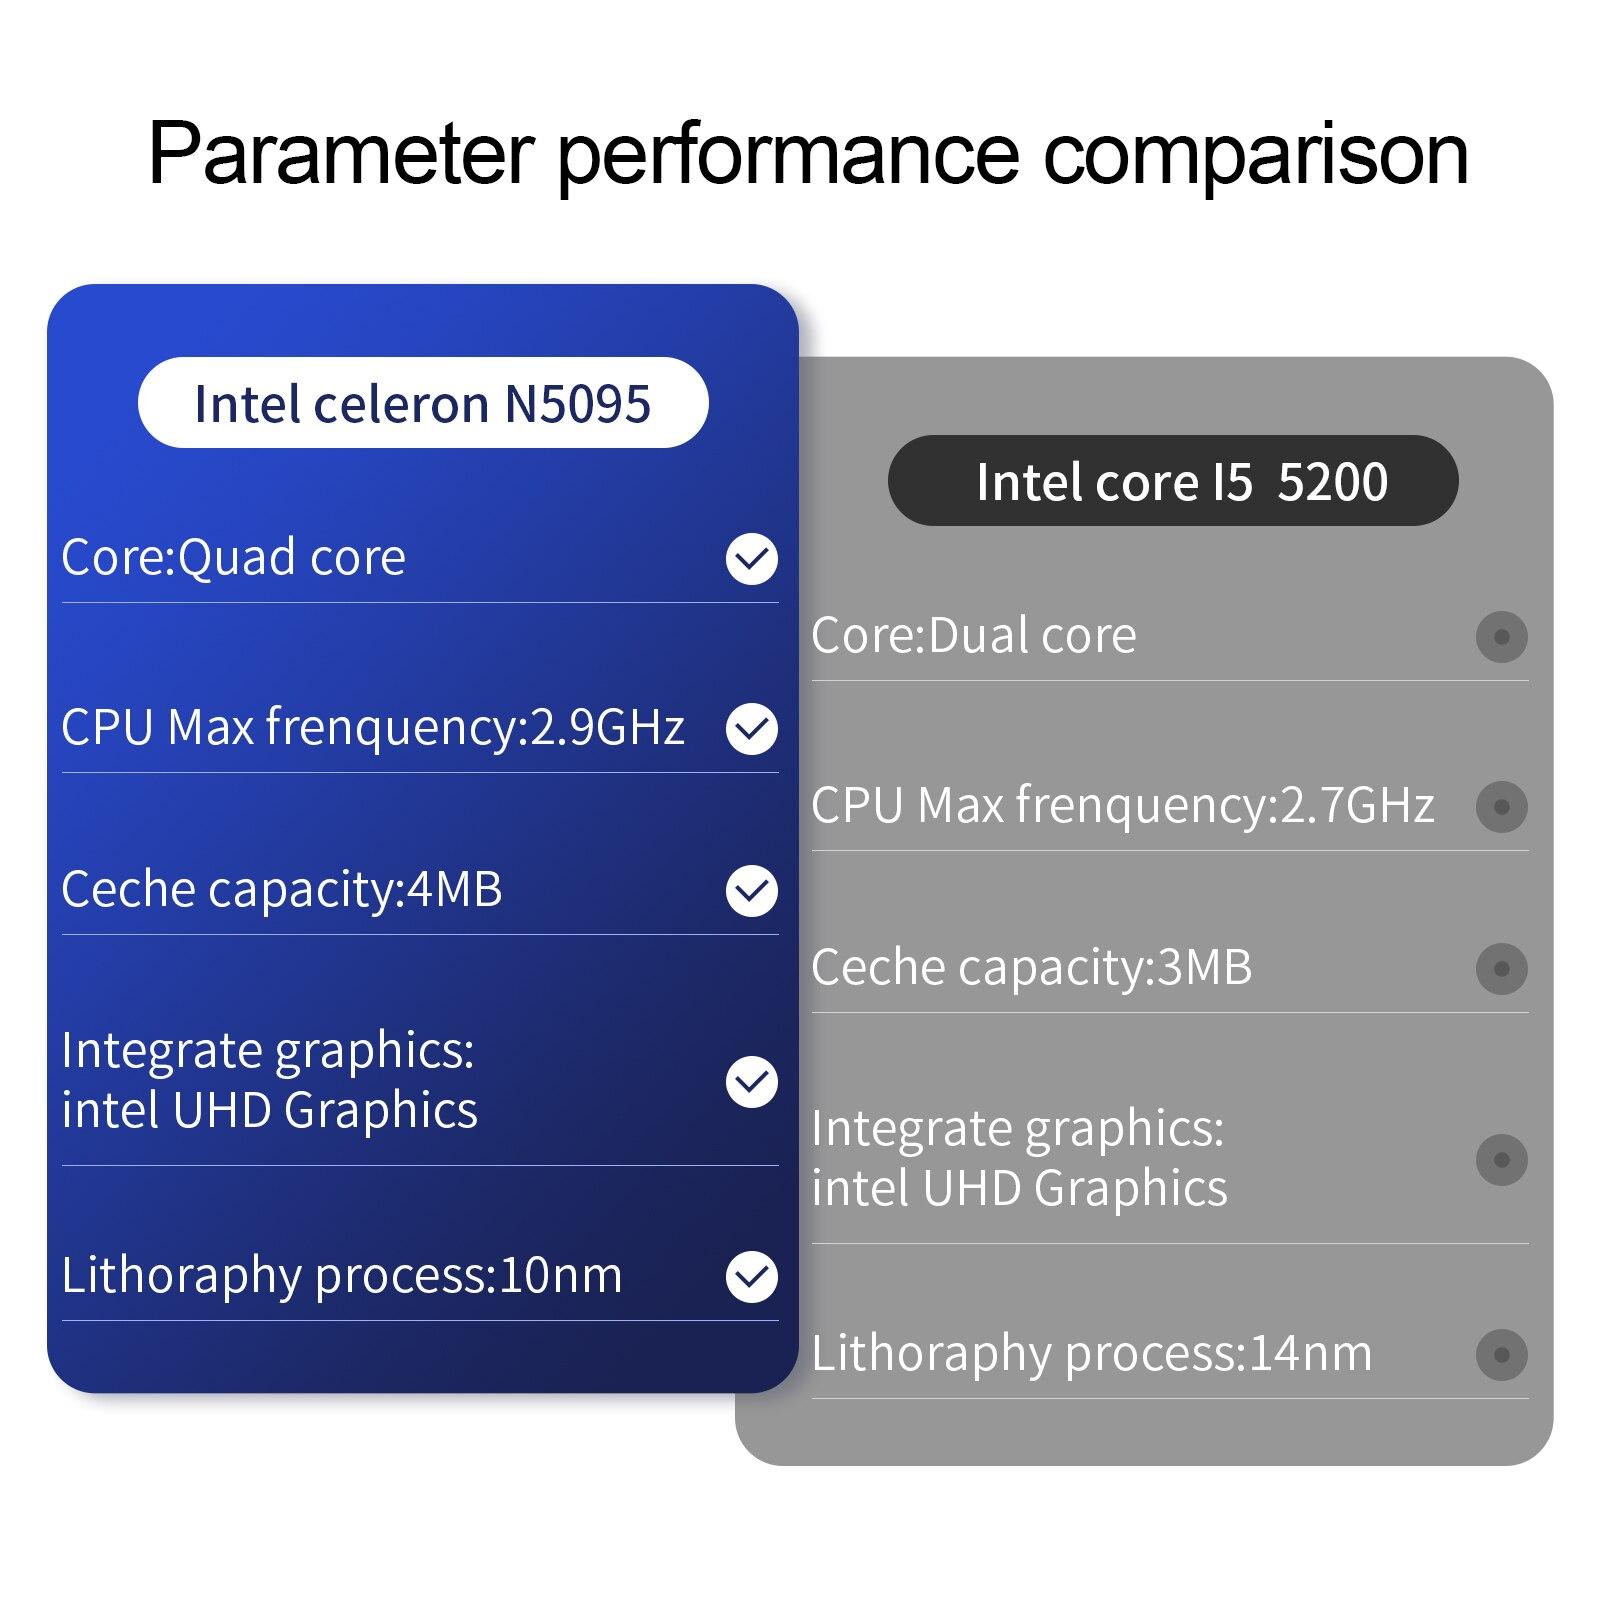 14.1 Inch N5095 Notebook 12GB Laptop Backlit Keyboard FHD 1920x1080 Windows 10 Pro Apollo 5G Dual Wifi Computer PC Slim Netbook